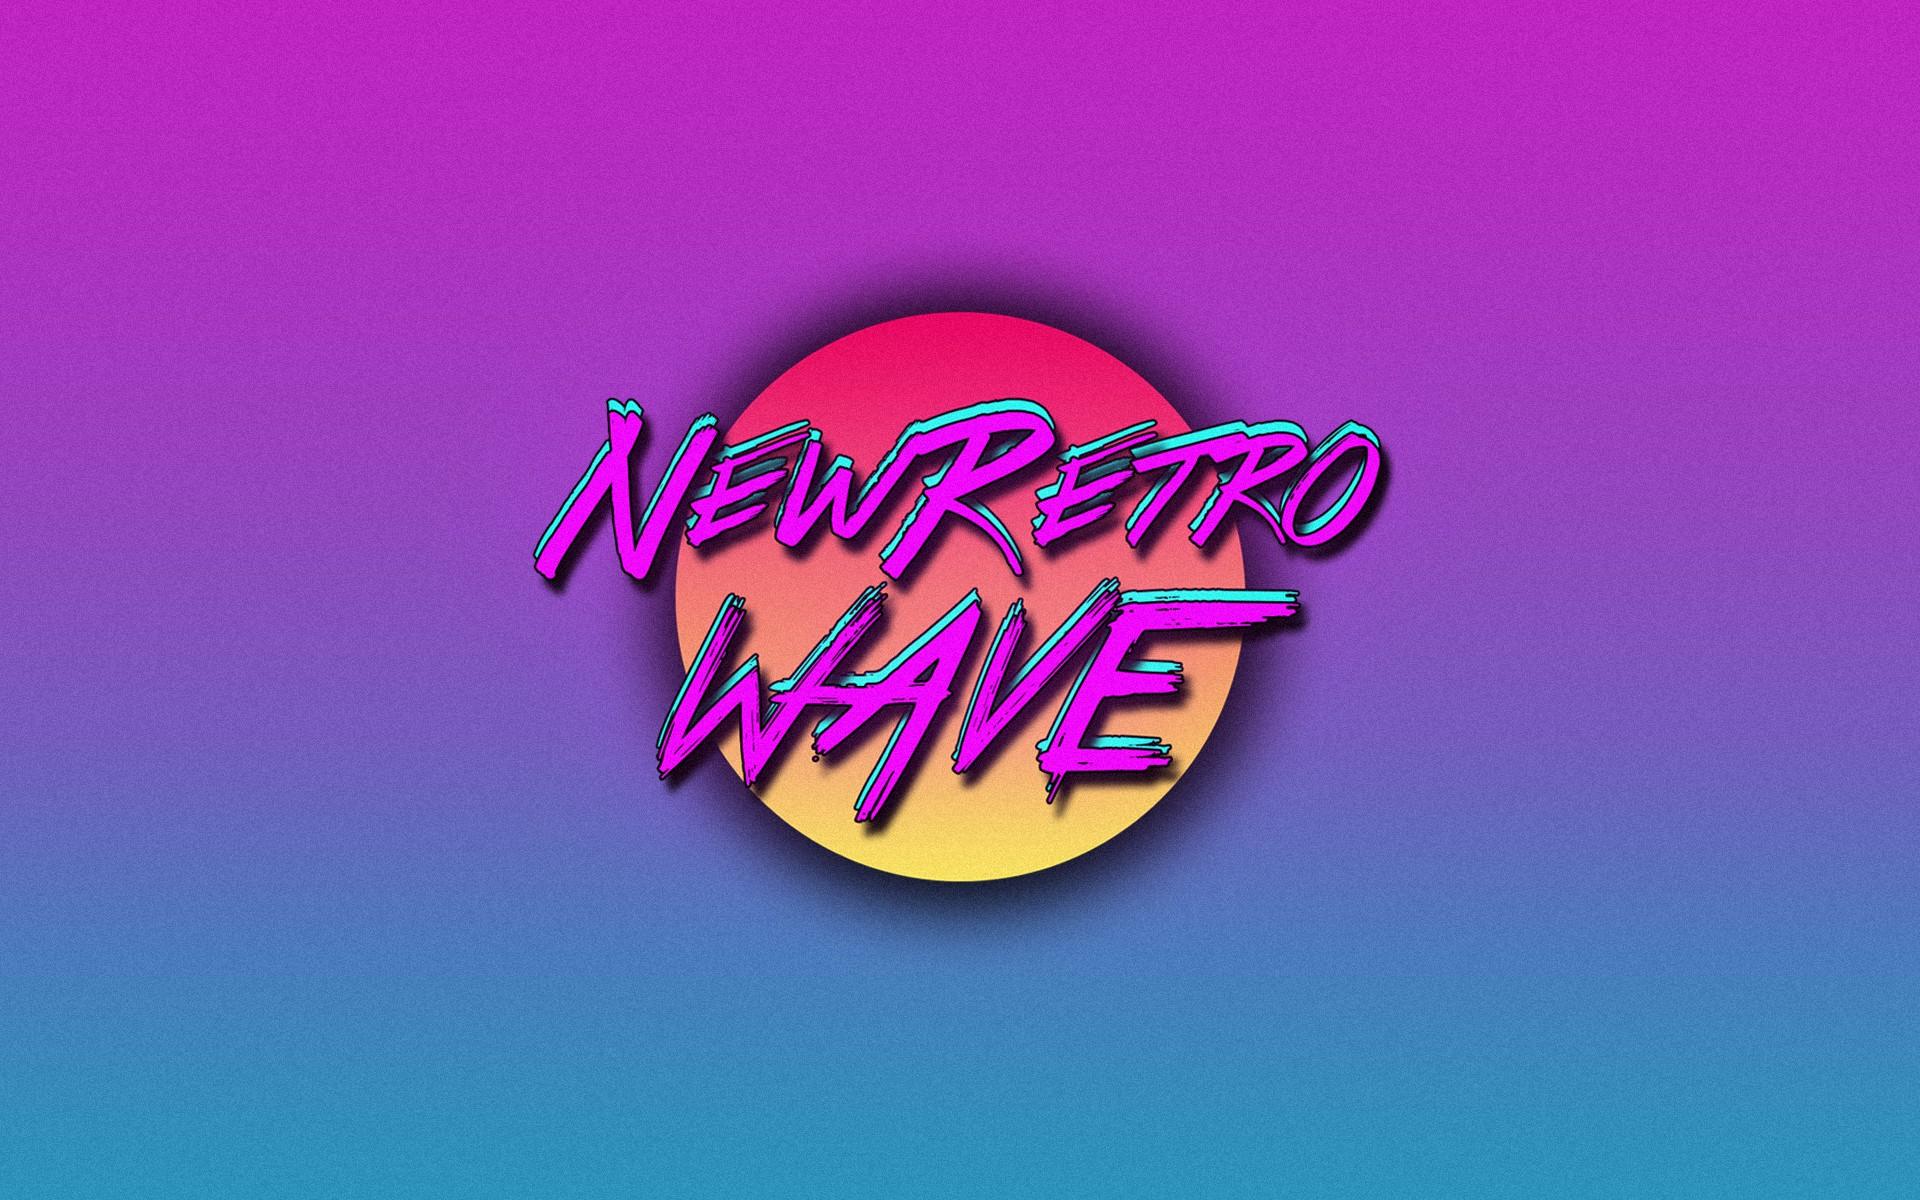 General 1920x1200 New Retro Wave vintage vintage synthwave neon 1980s retro games digital art simple background typography